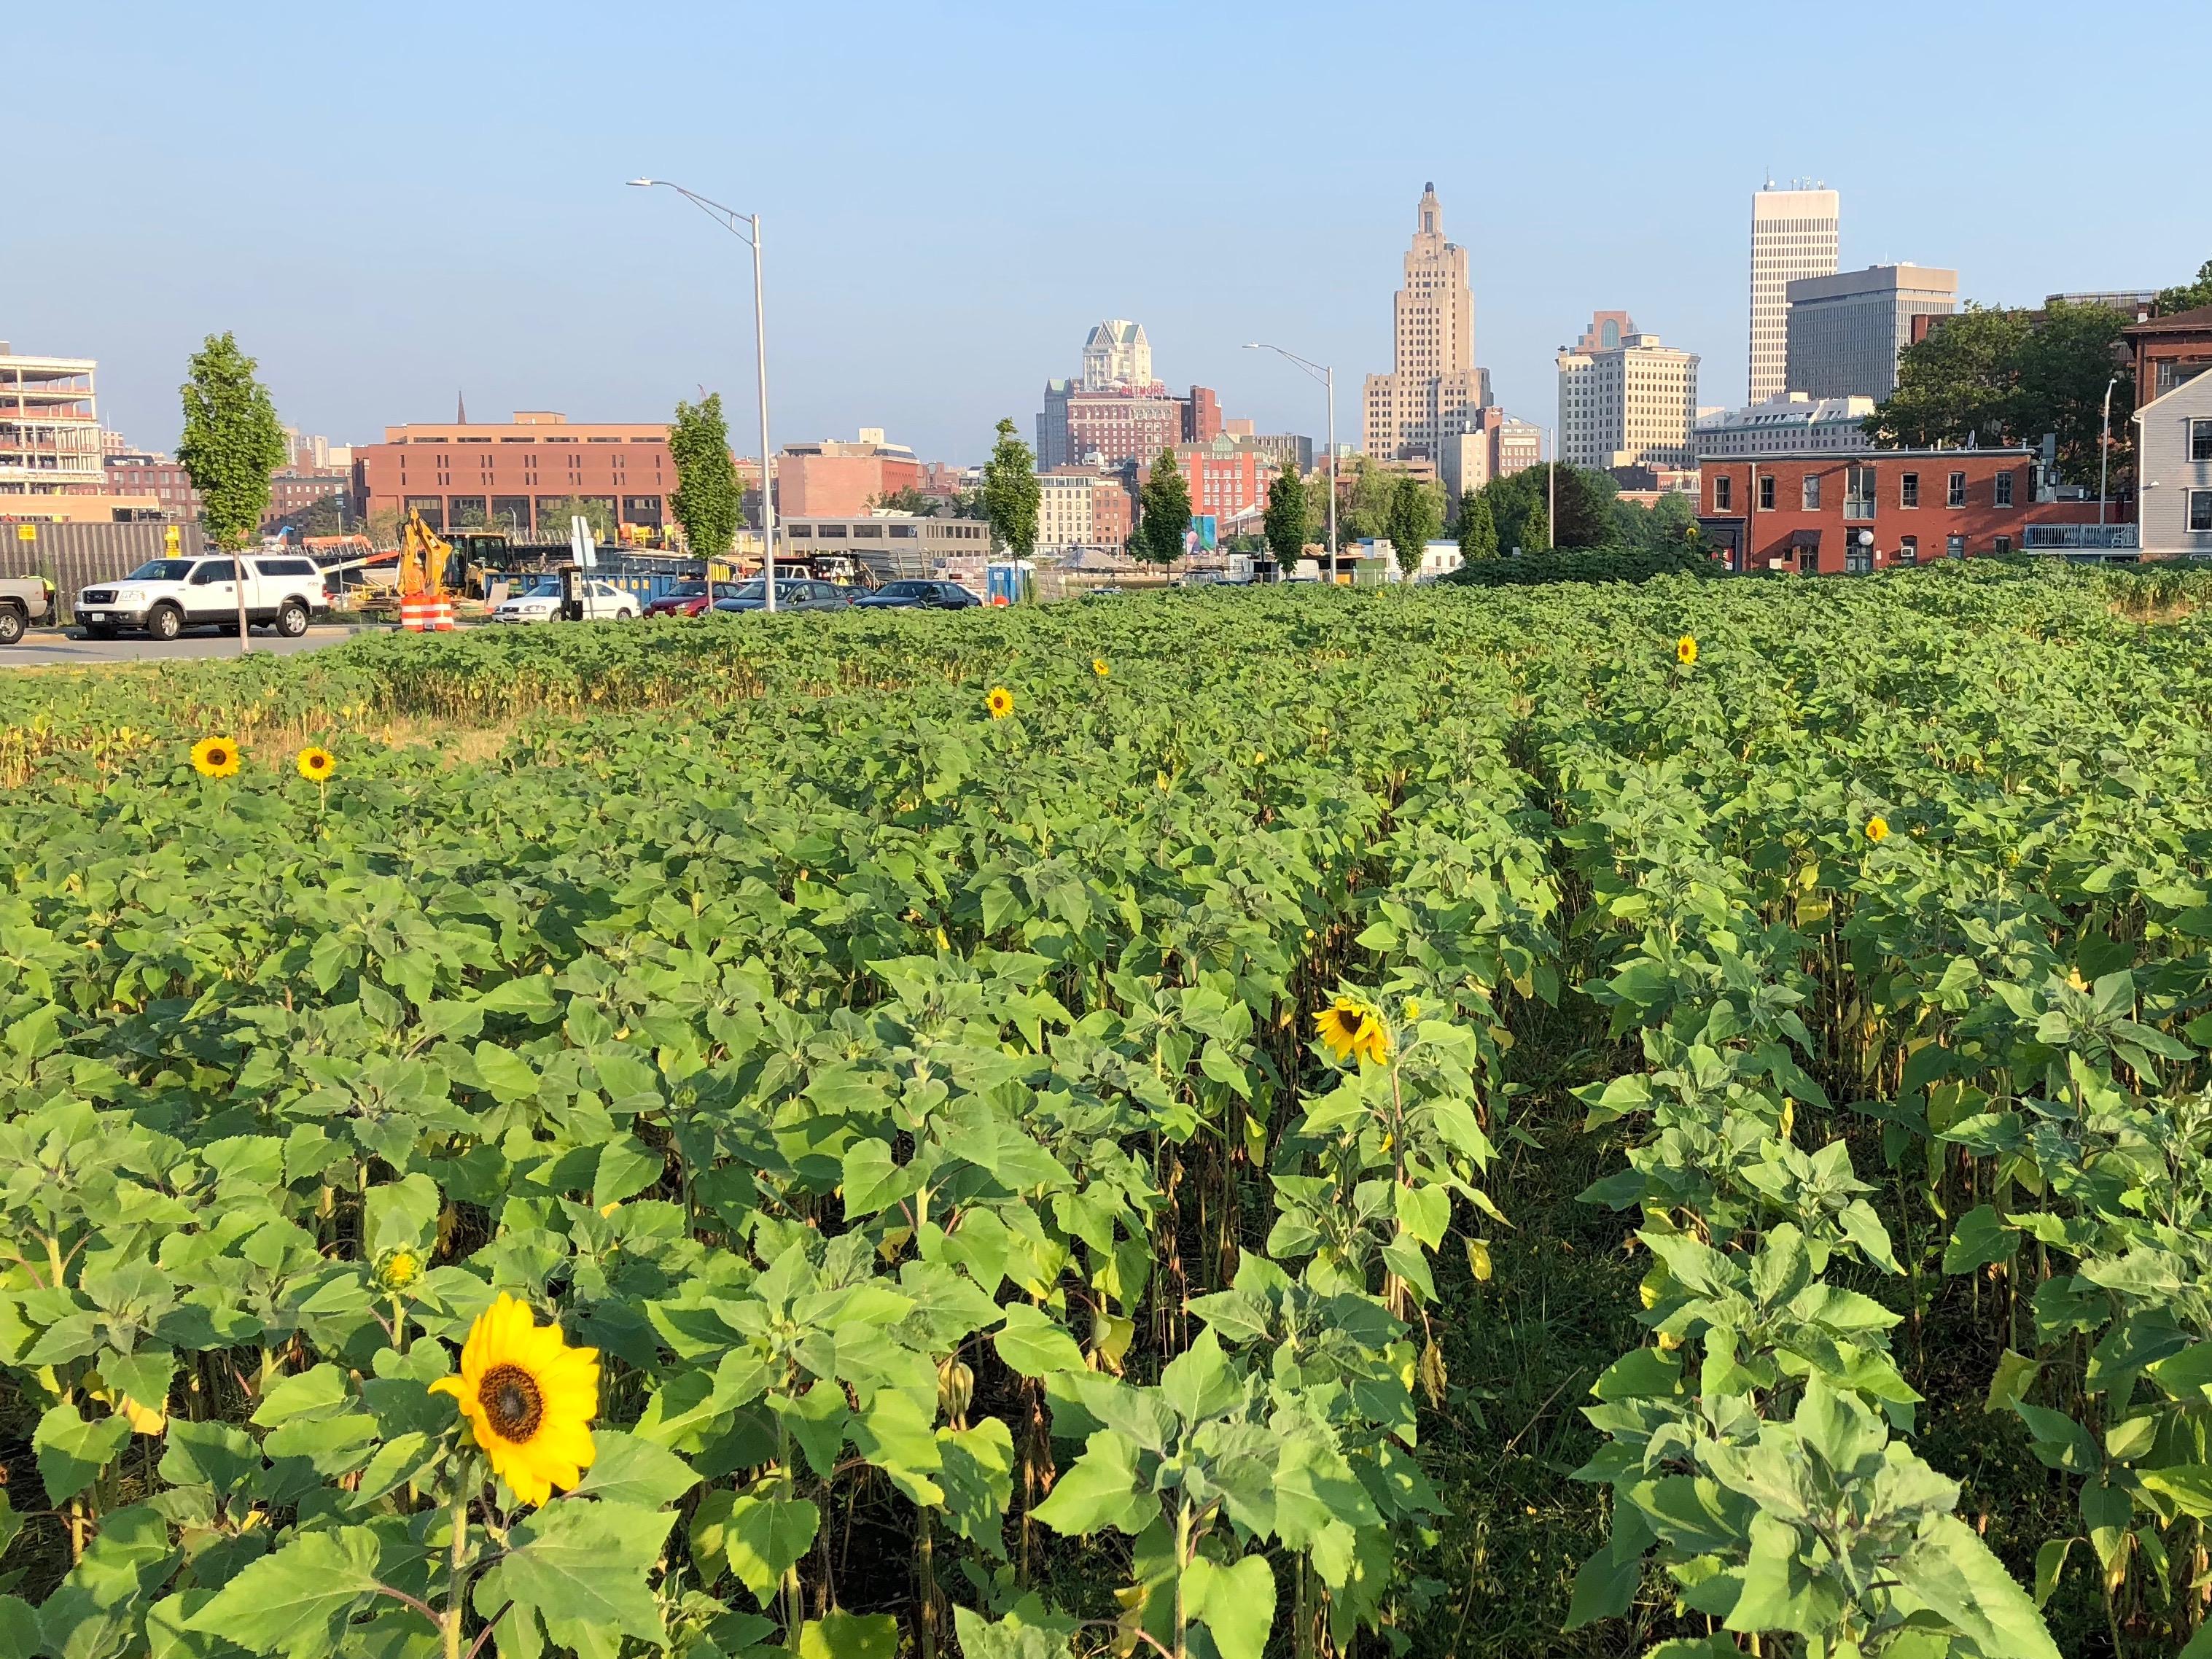 071618-sunflowers-improve-bad-soil